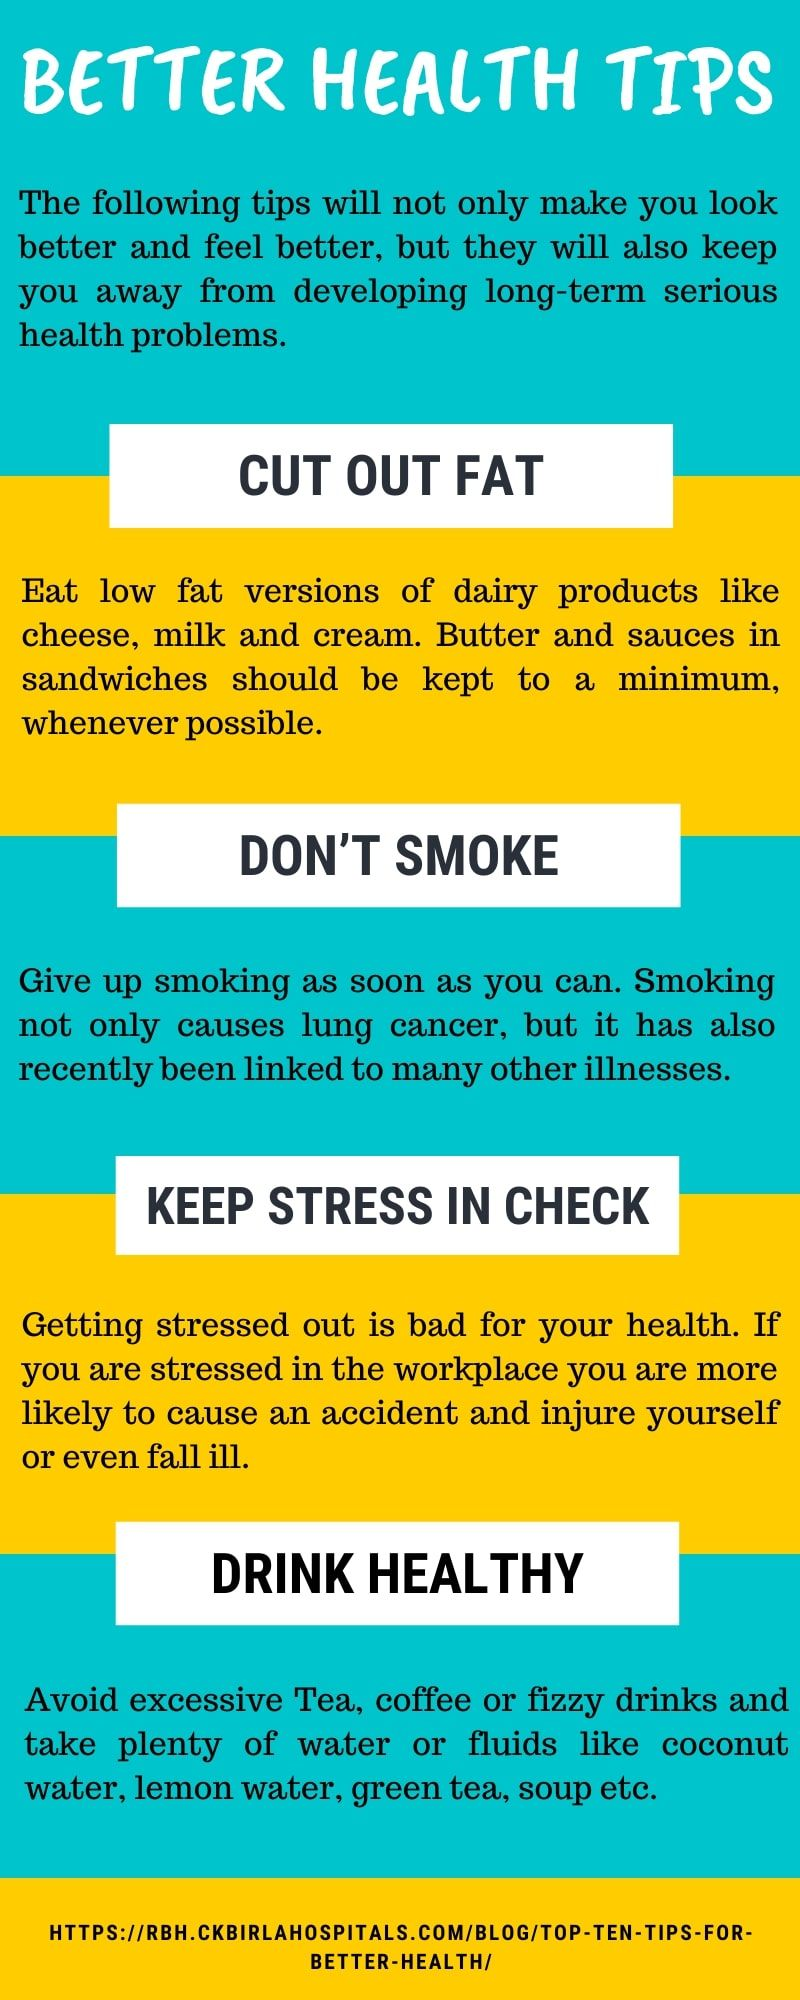 Ten Tips For Better Health Good Health Tips Health And Wellness Health